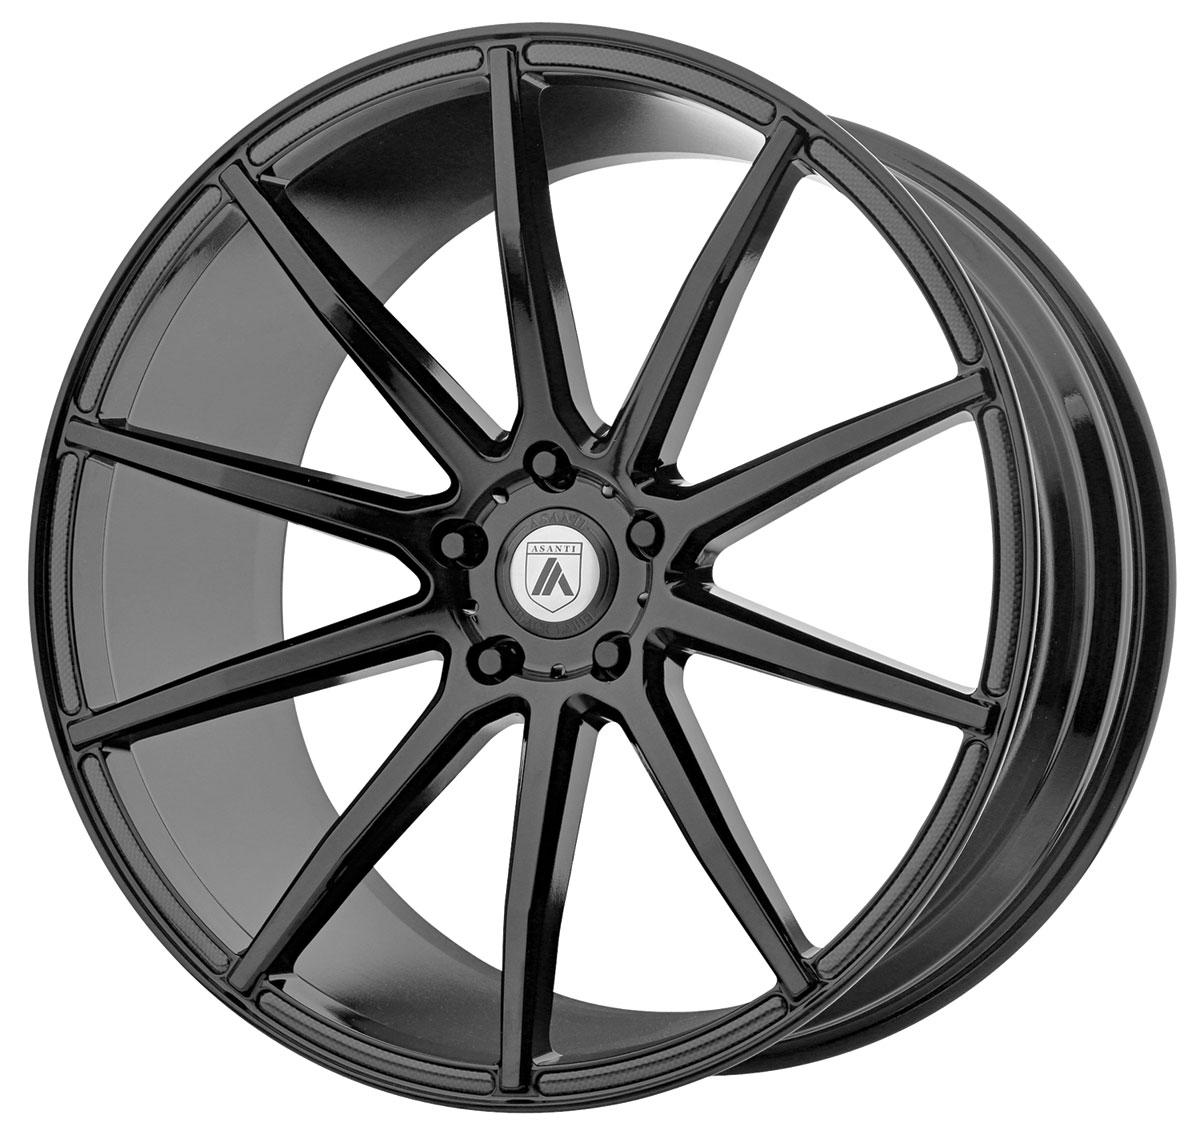 Wheel, Asanti Black, ARIES, 2016-19 CTS/CTS-V, 22x9